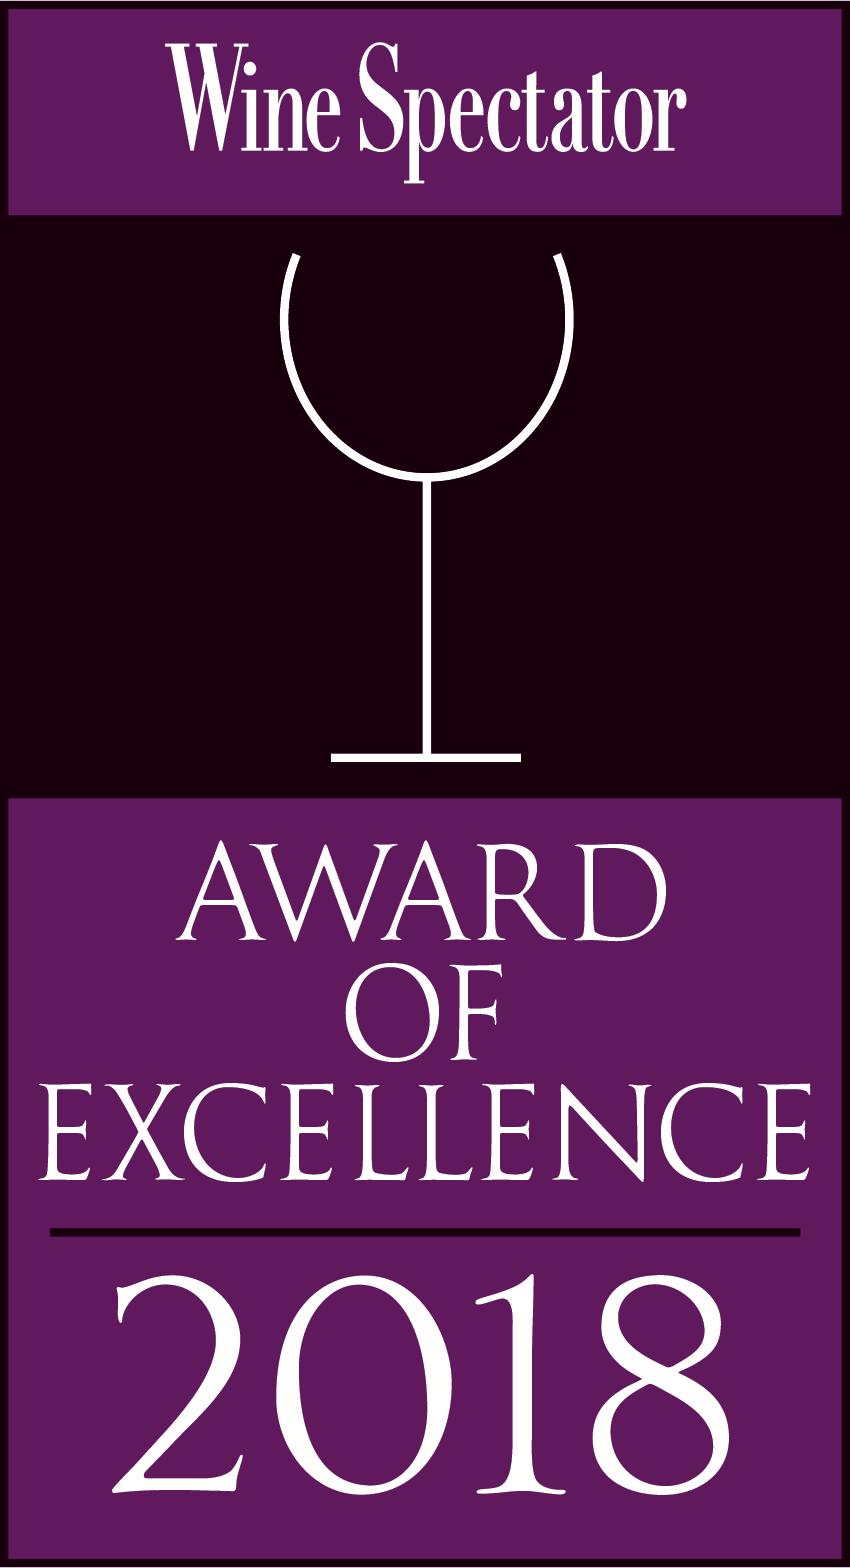 edison-tampa_WineSpectator-award2018